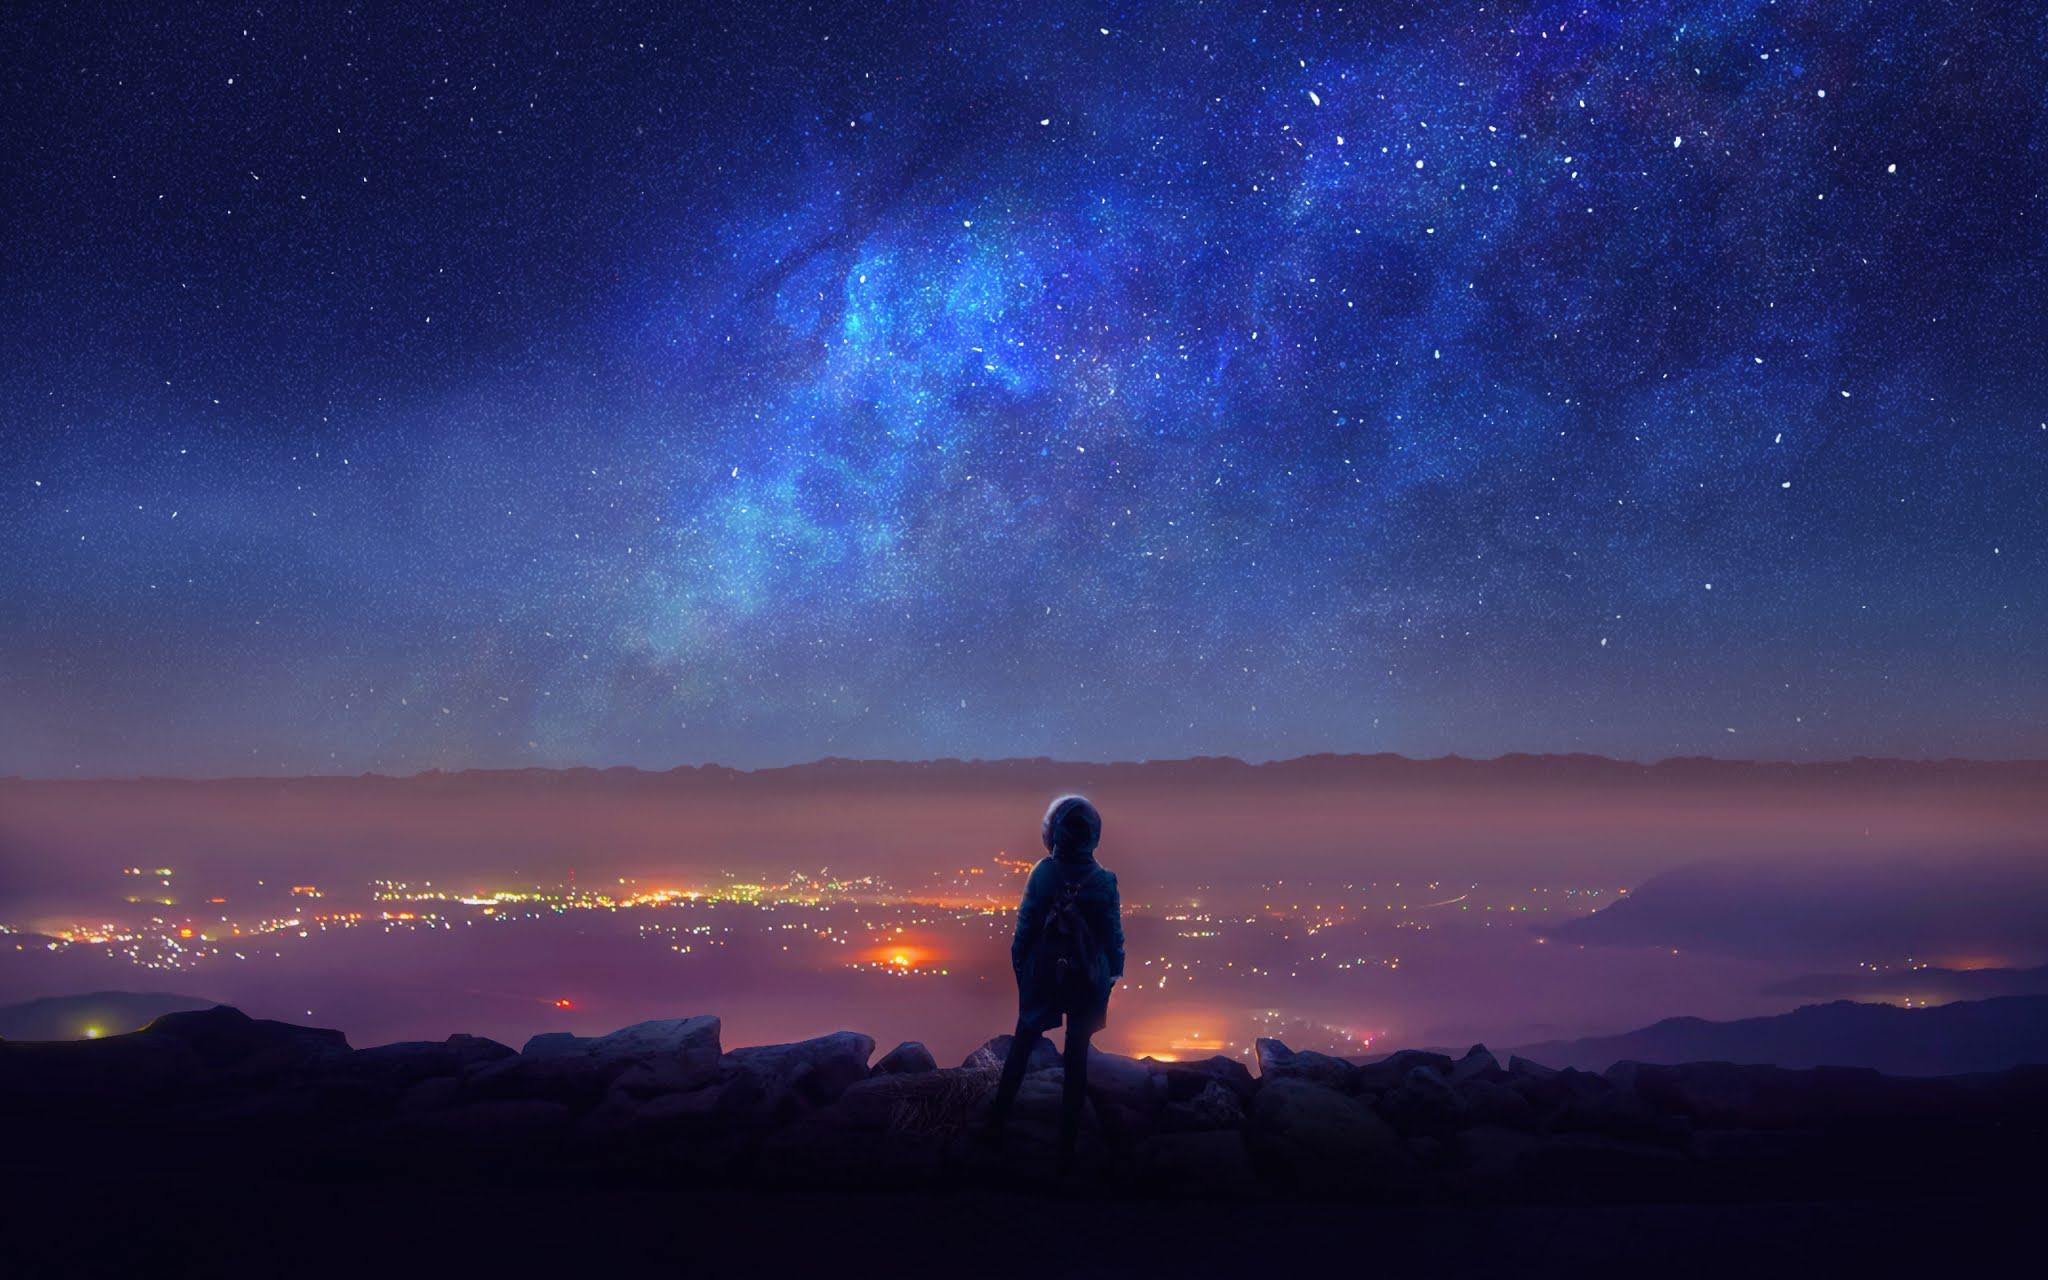 Beautiful Night View Wallpaper 2048x1280